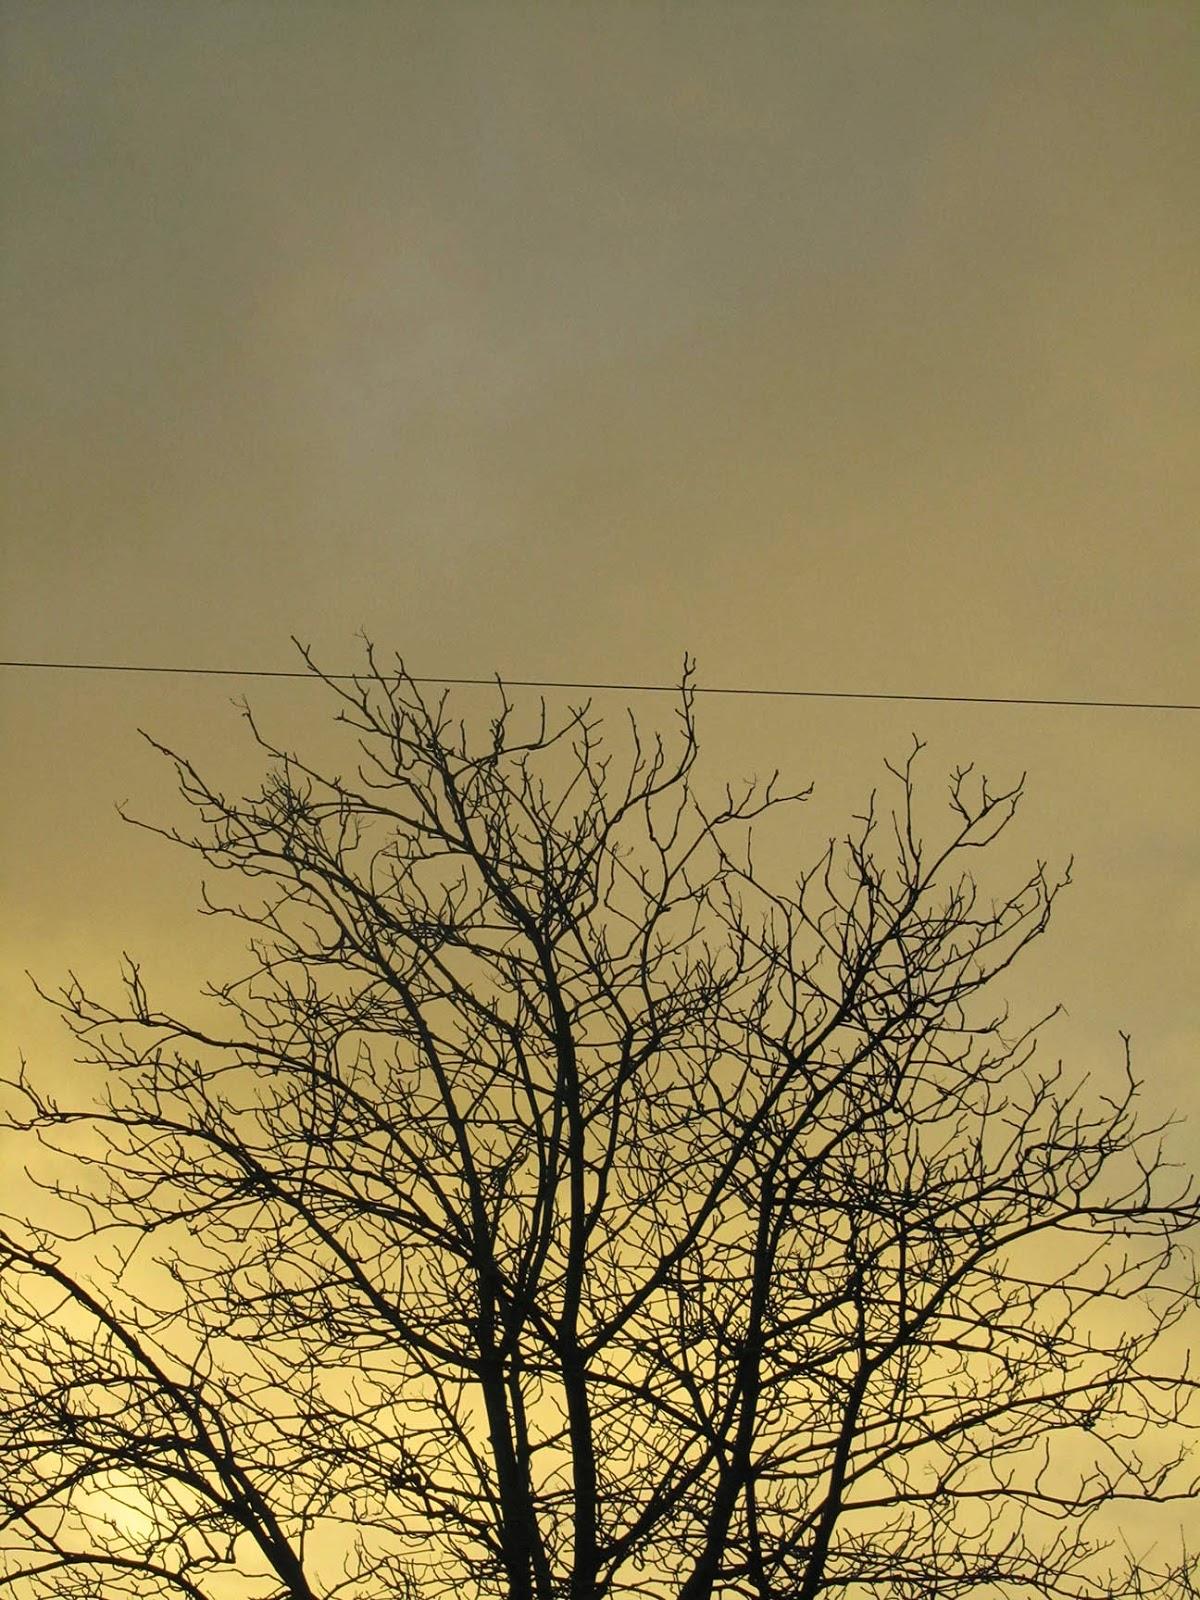 eery light with tree